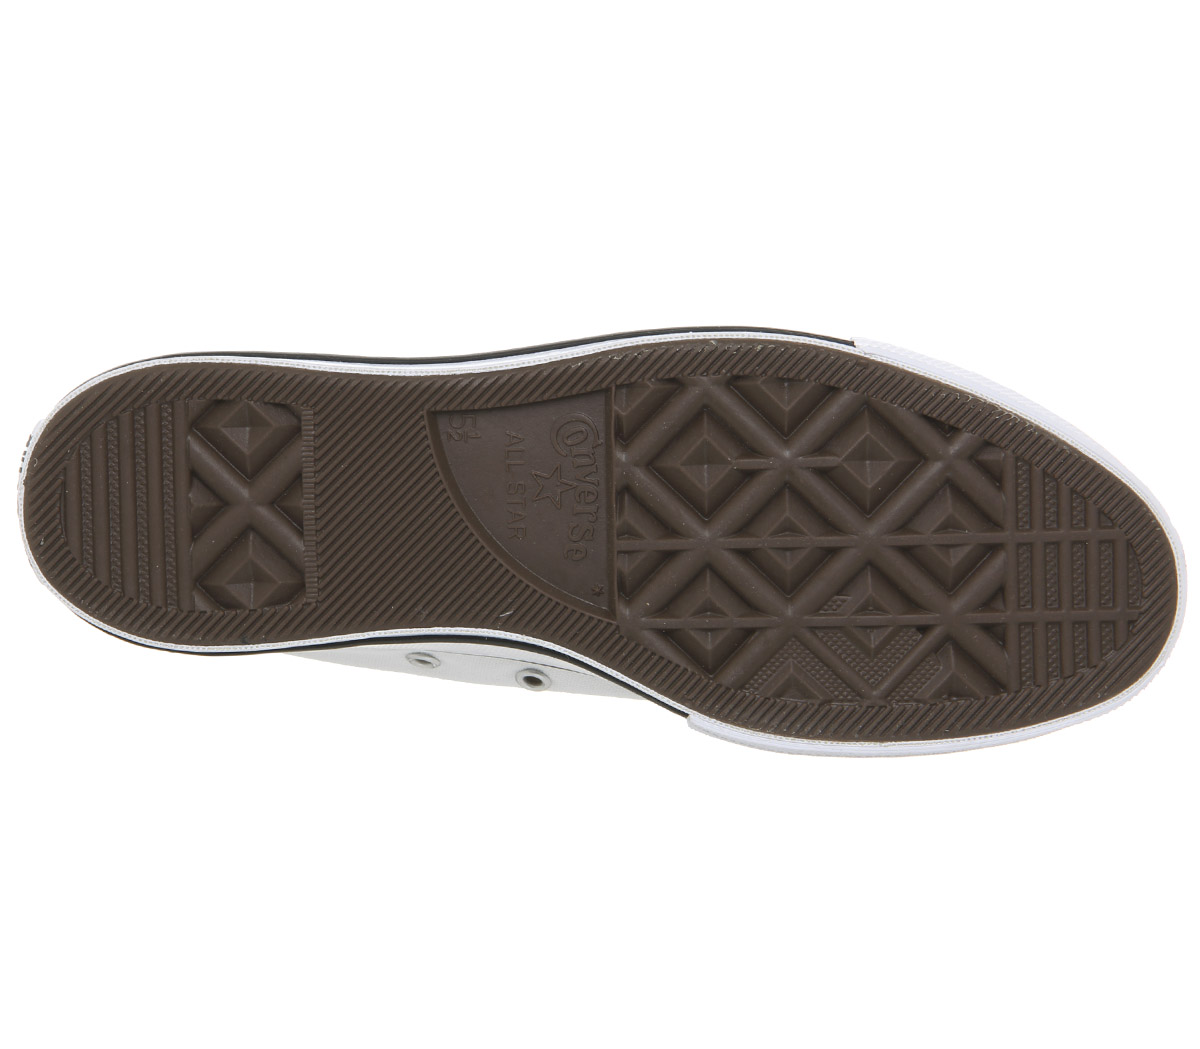 Womens-Converse-Converse-Platform-Hi-Trainers-White-Black-White-Trainers-Shoes thumbnail 12